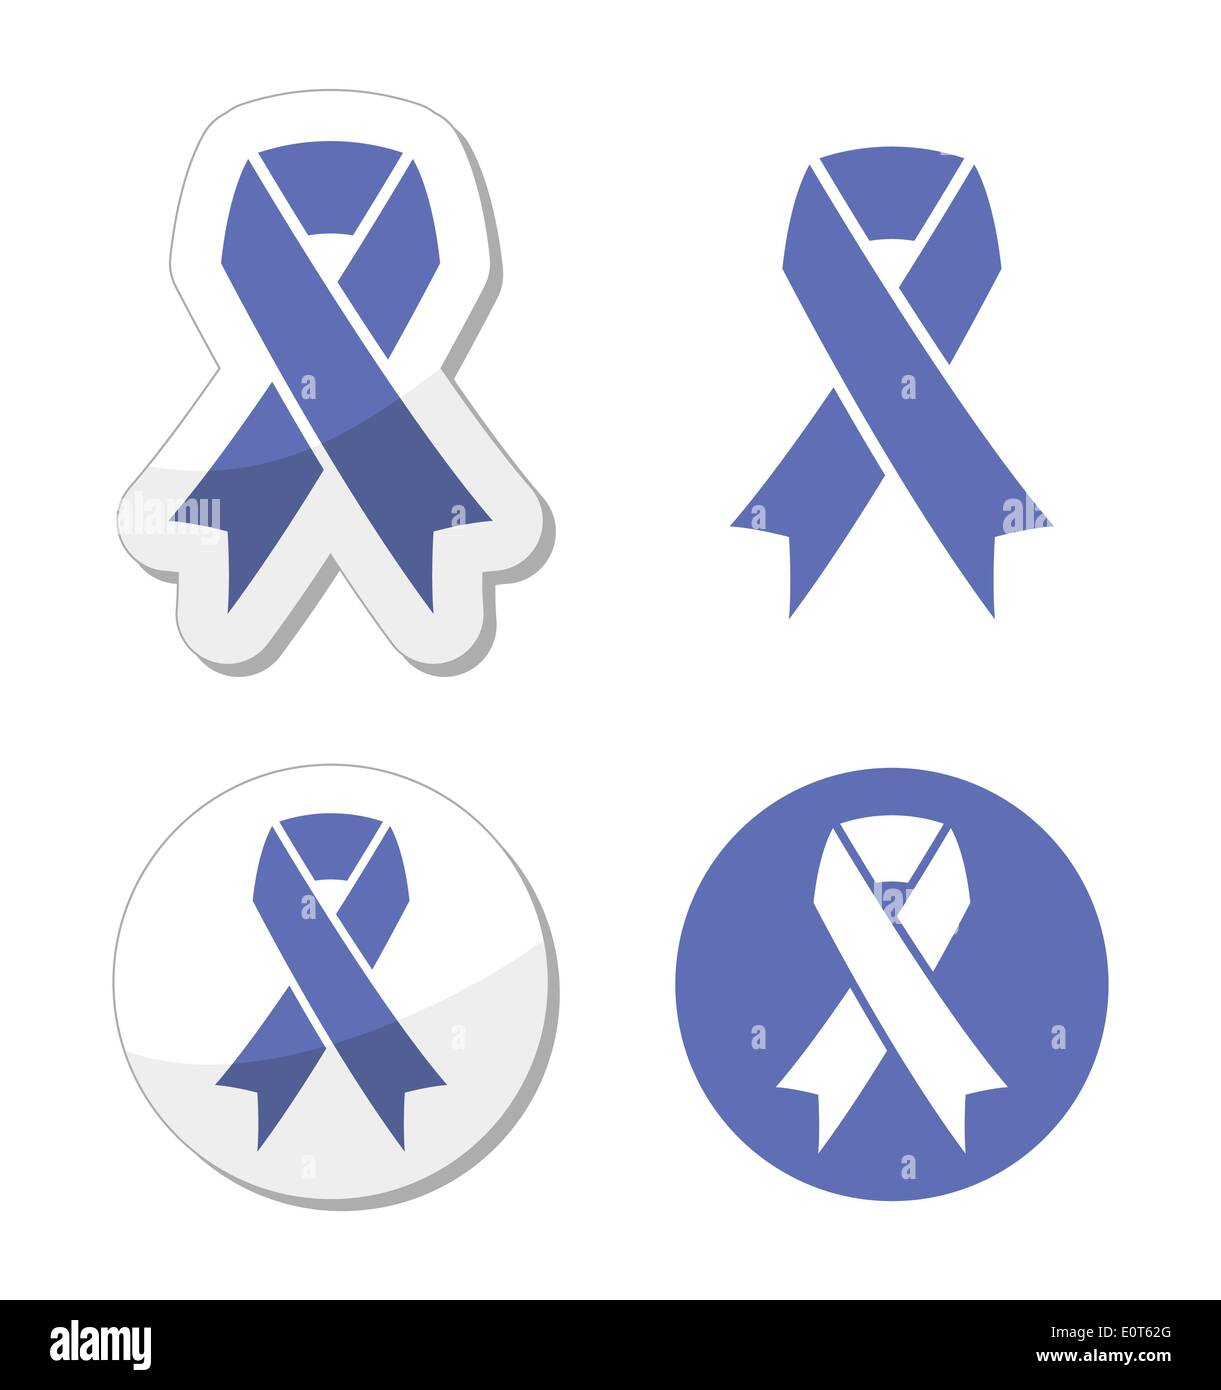 Periwinkle ribbons set - eating disorder symbol - Stock Image